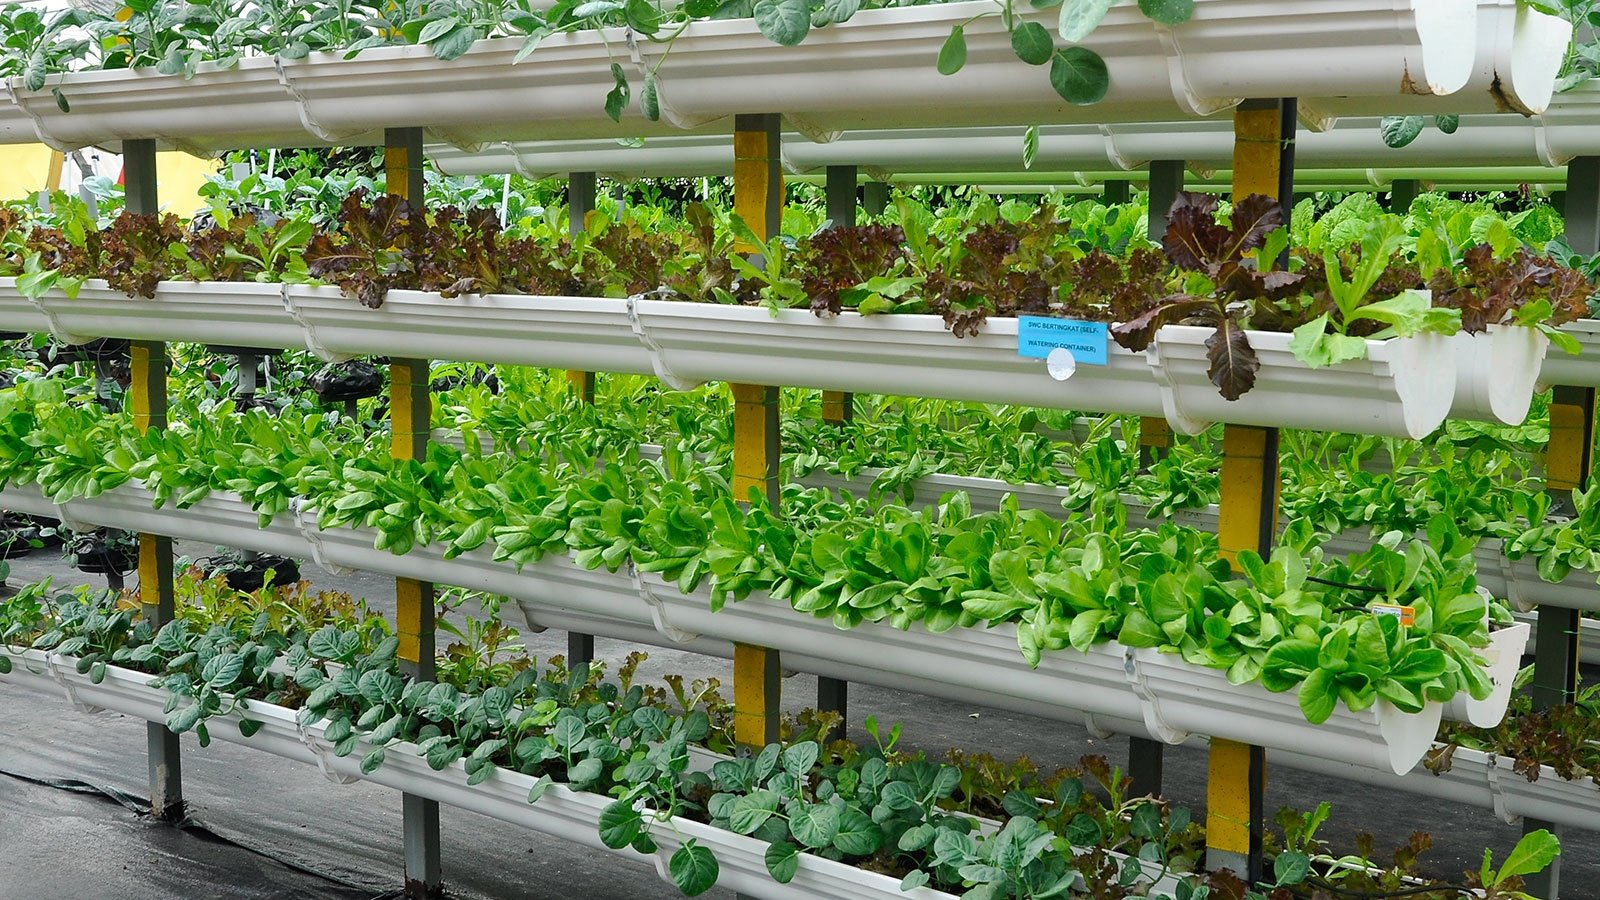 Vegetables Are Grown Using Fertigation System